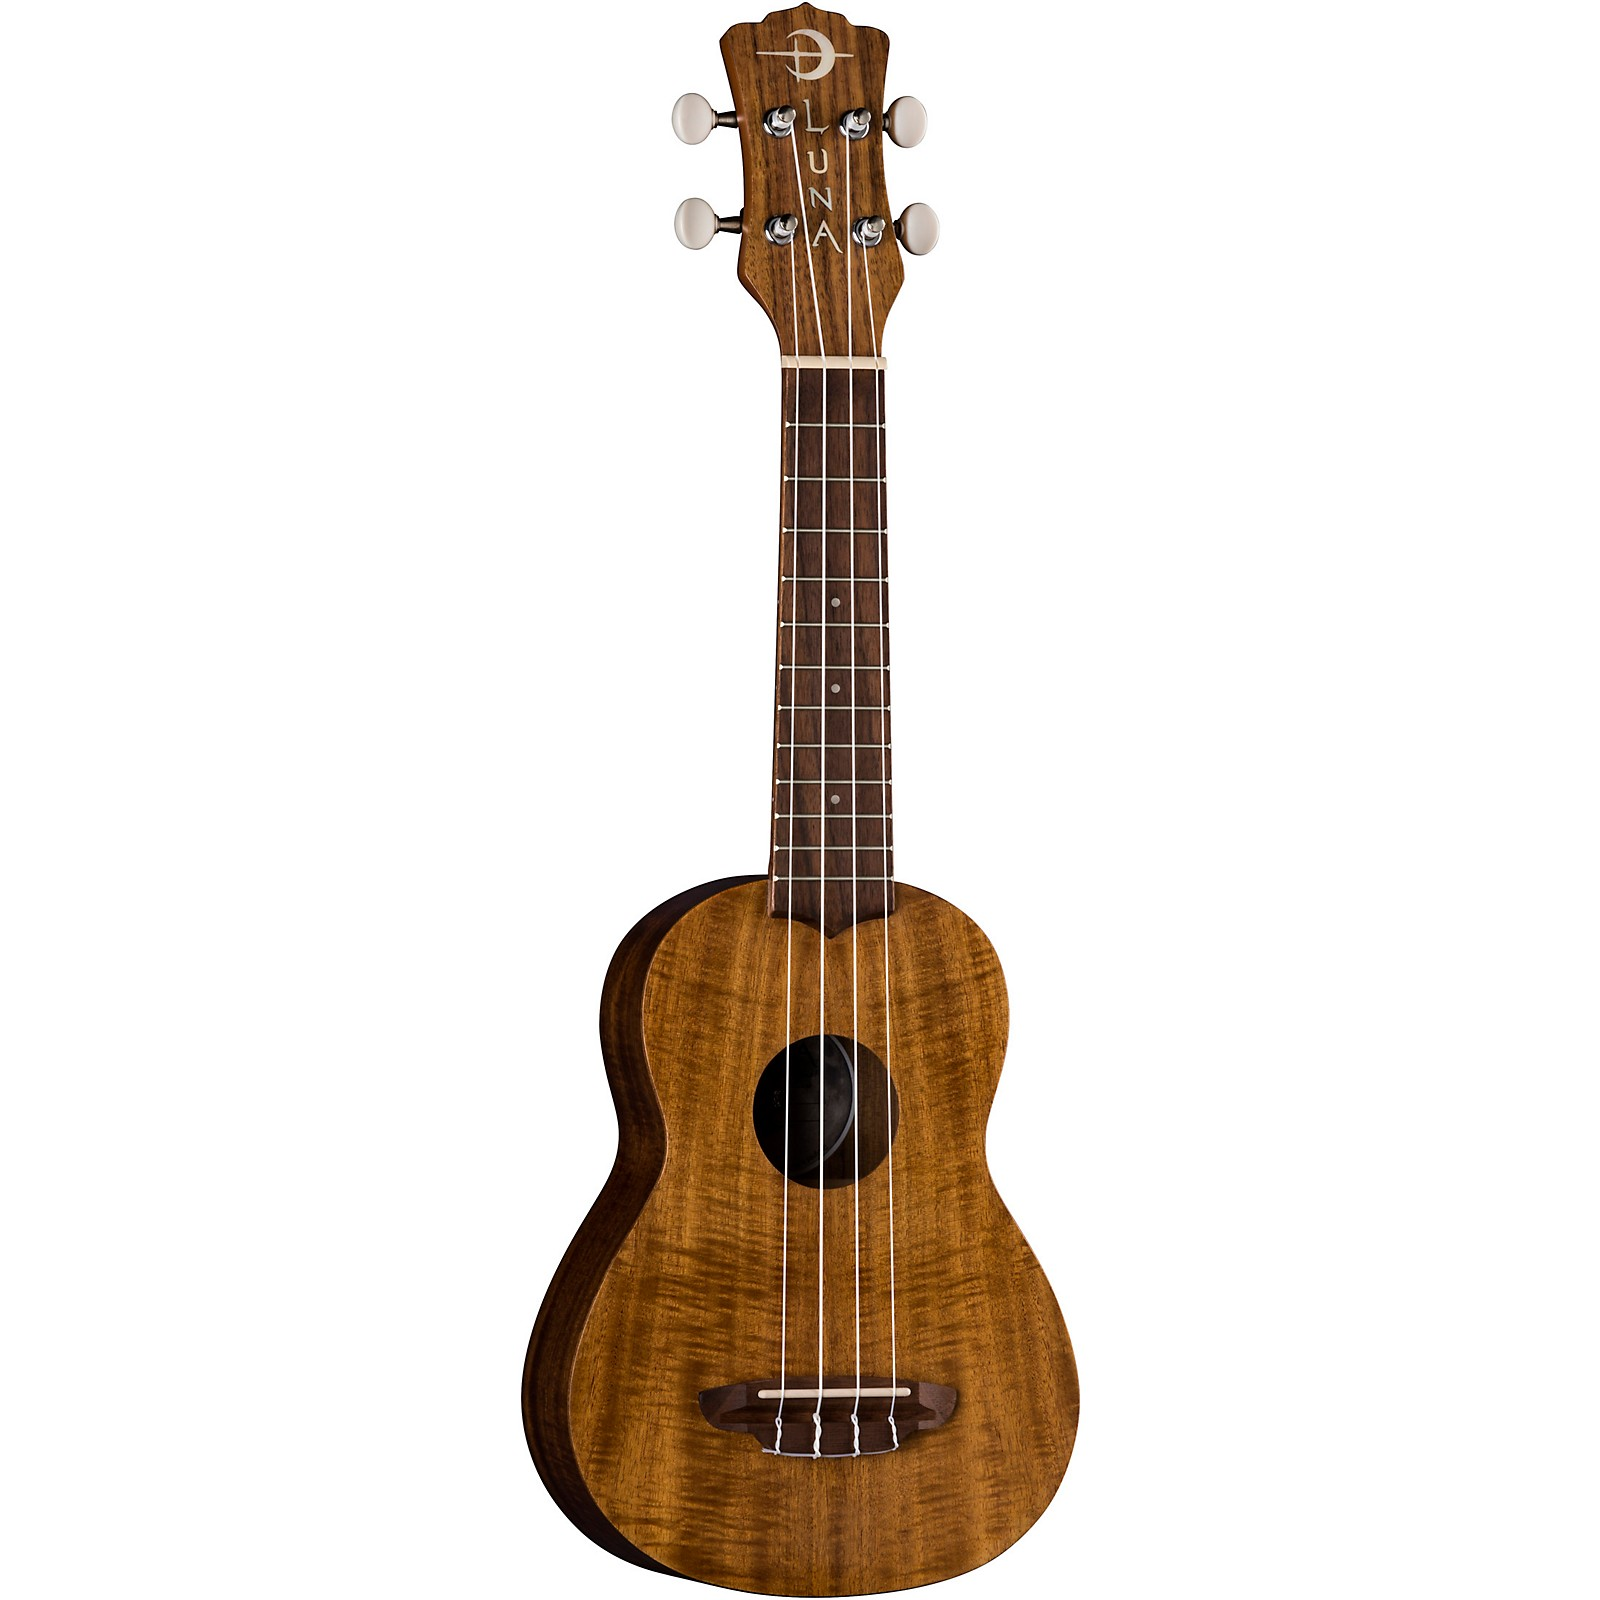 Luna Guitars Flamed Acacia Soprano Ukulele